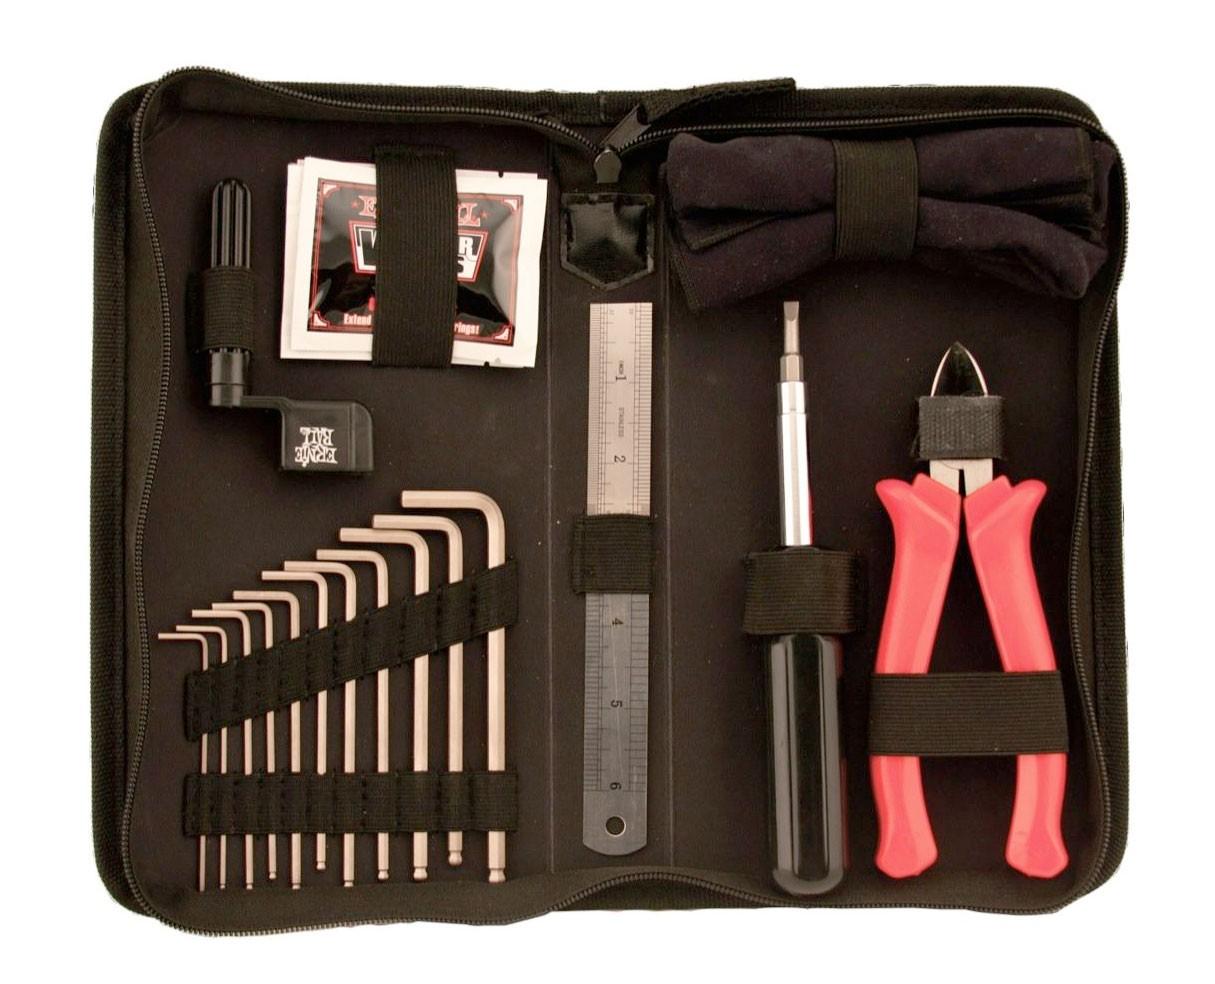 Ernie Ball Musician's Tool Kit (P04114)